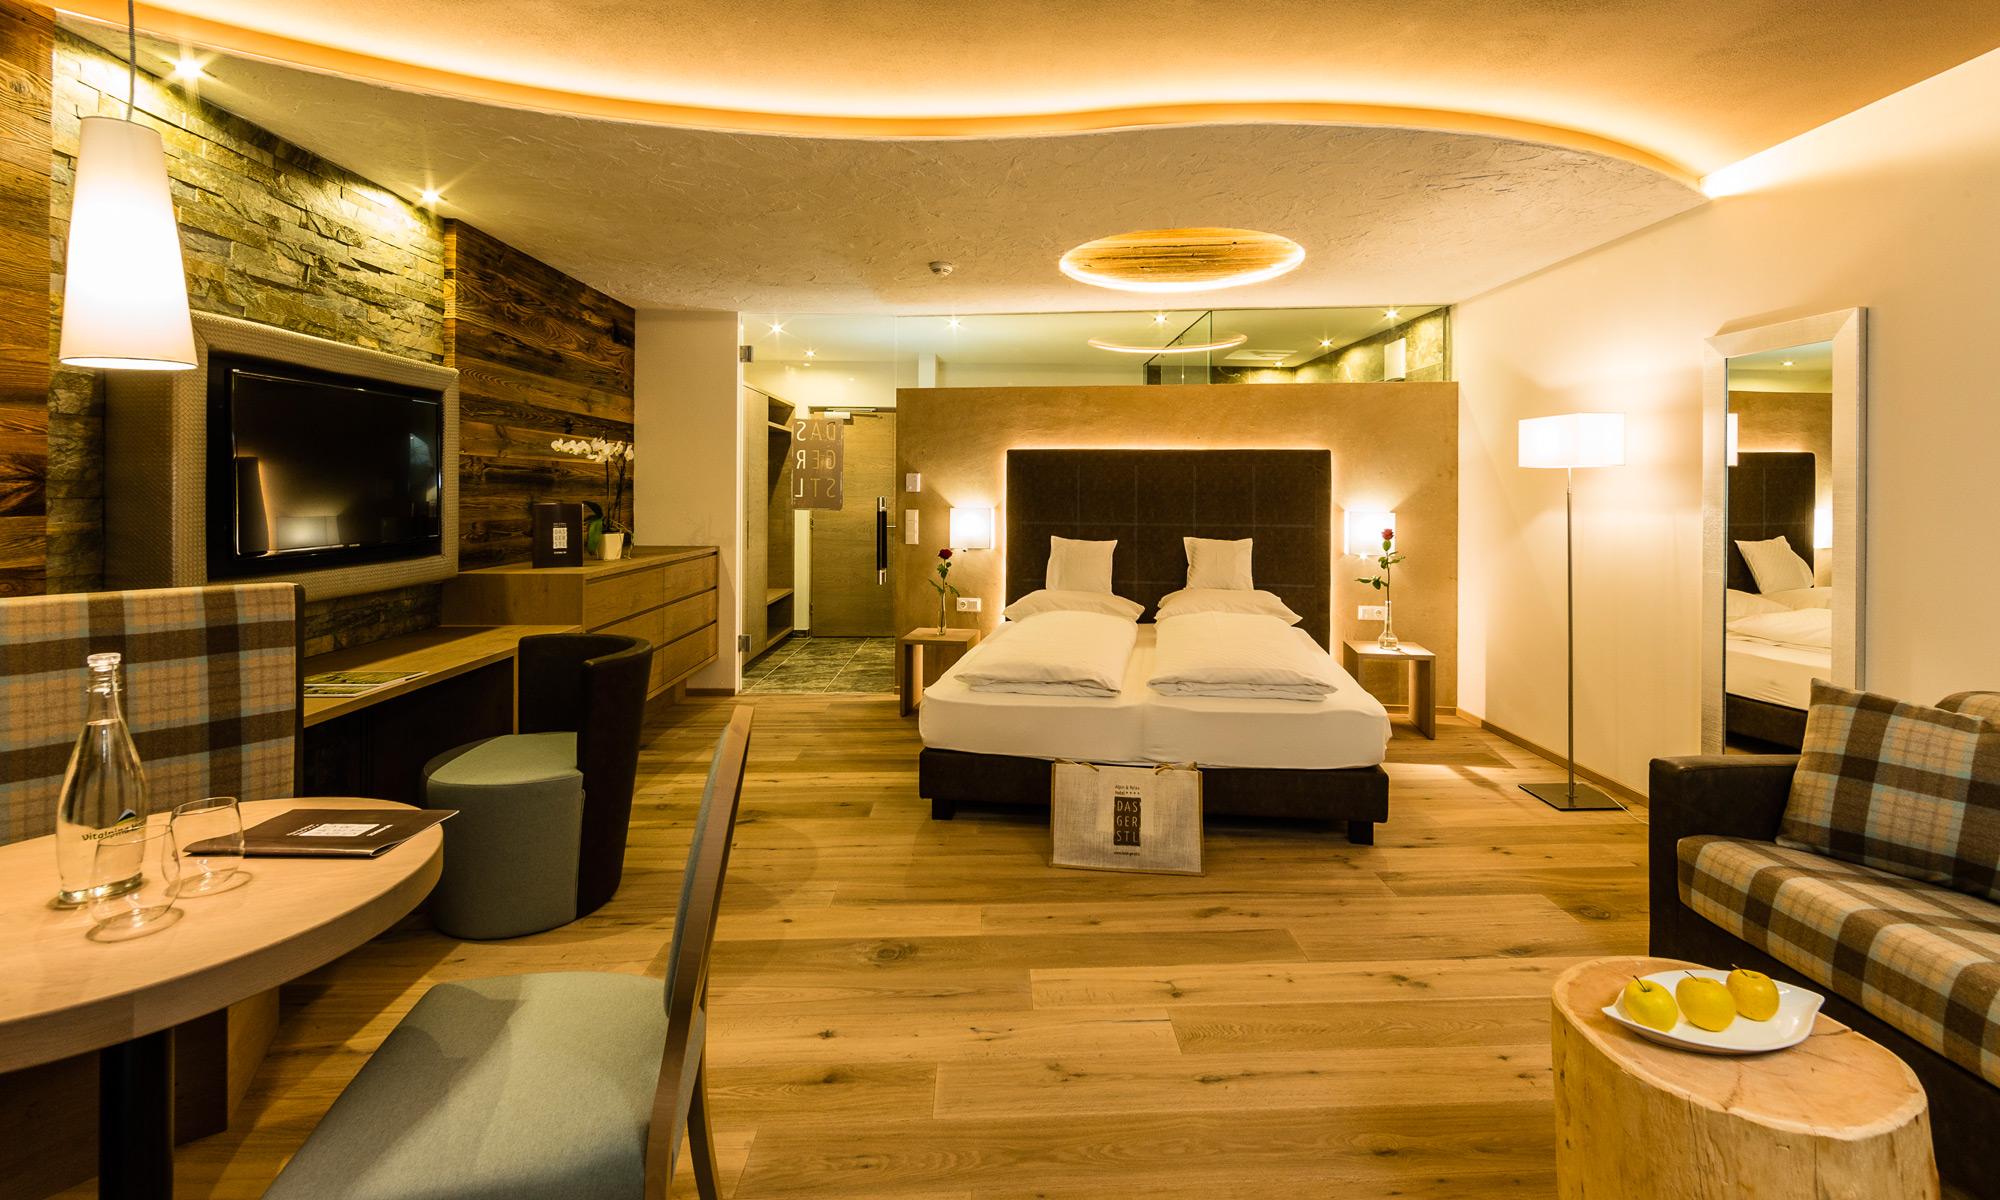 Alpin relax hotel das gerstl zimmer suiten for Zimmer suite